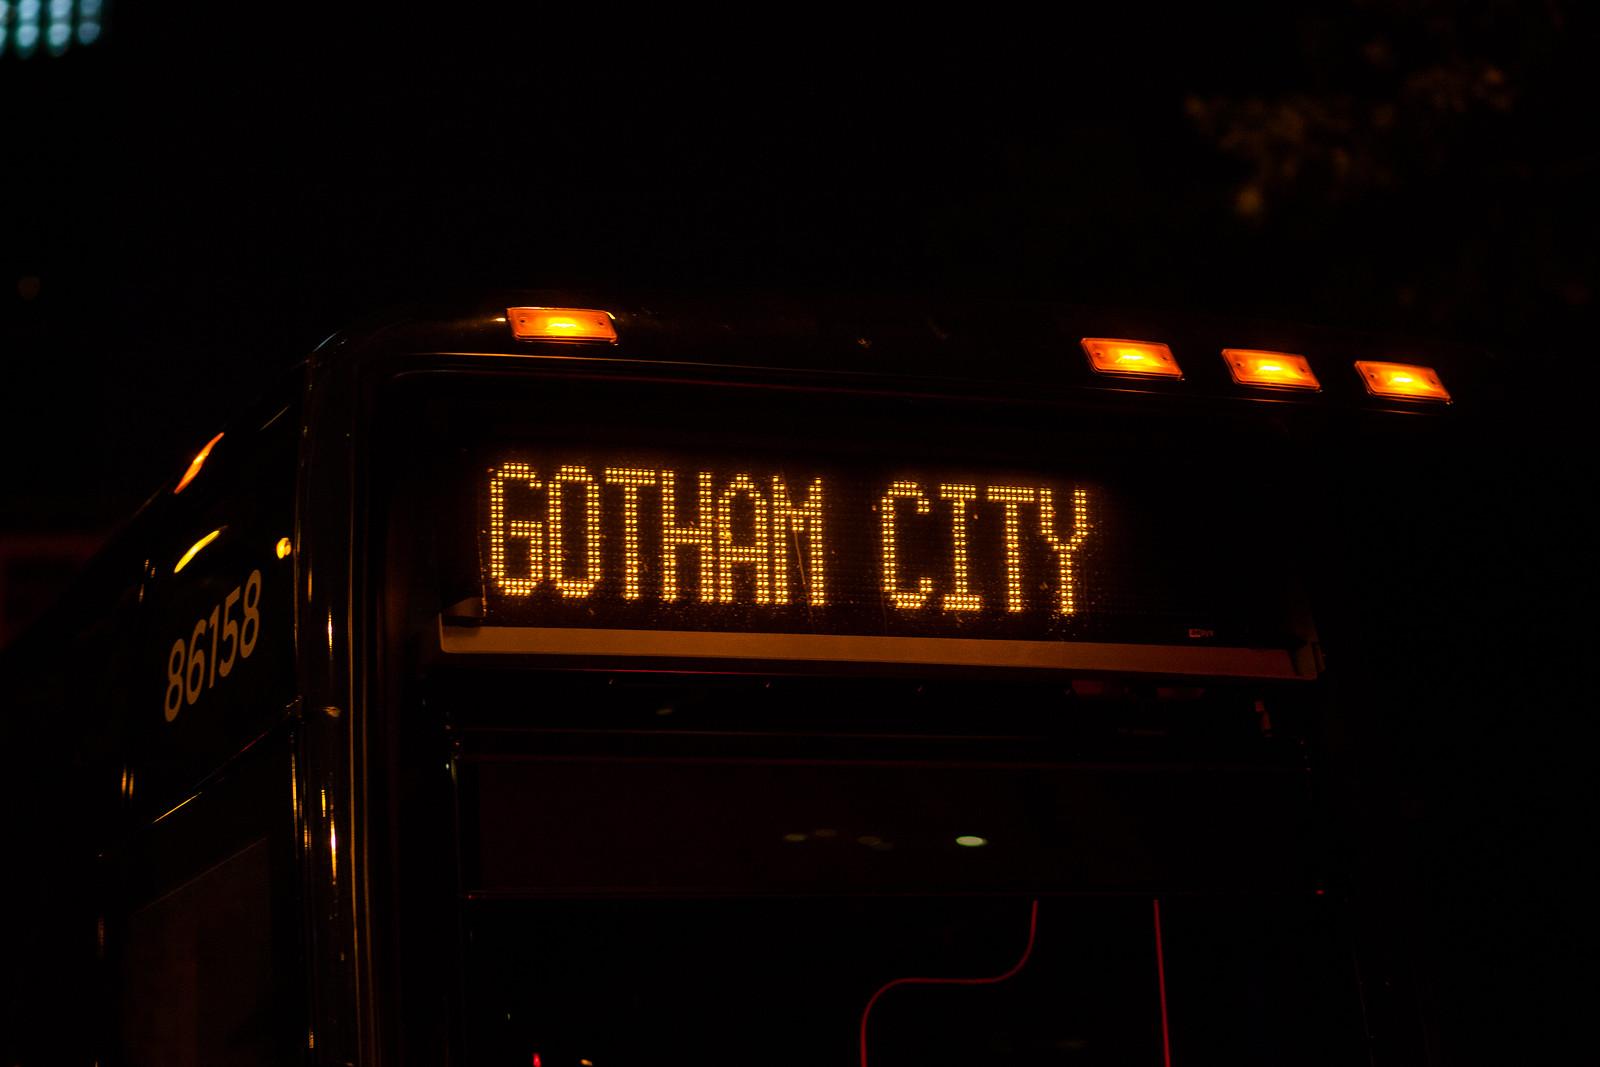 Gotham City by wwward0